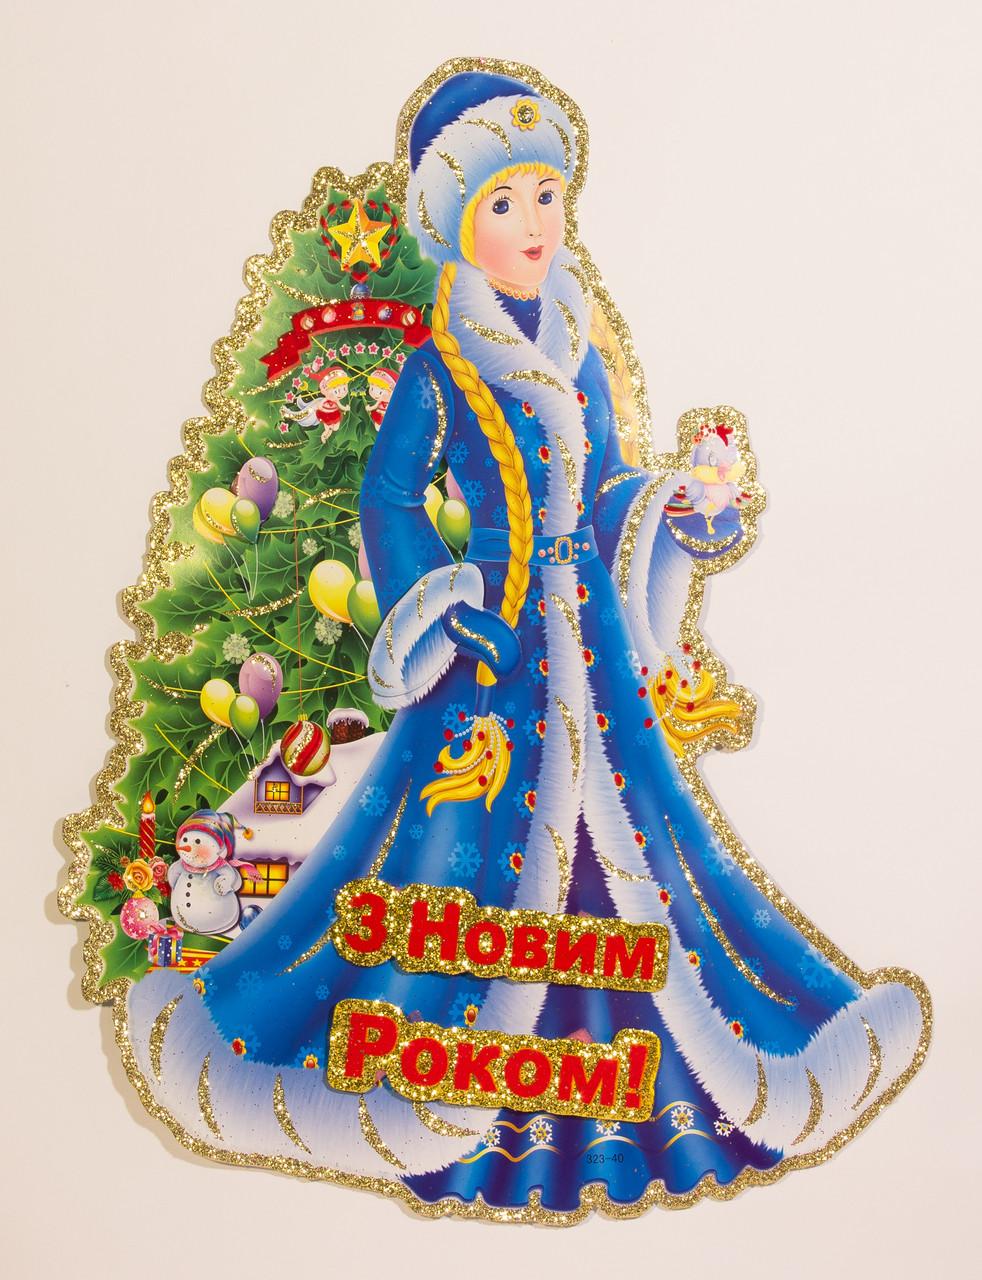 Декорация на окно - Снегурочка, 56*40 см (471430)